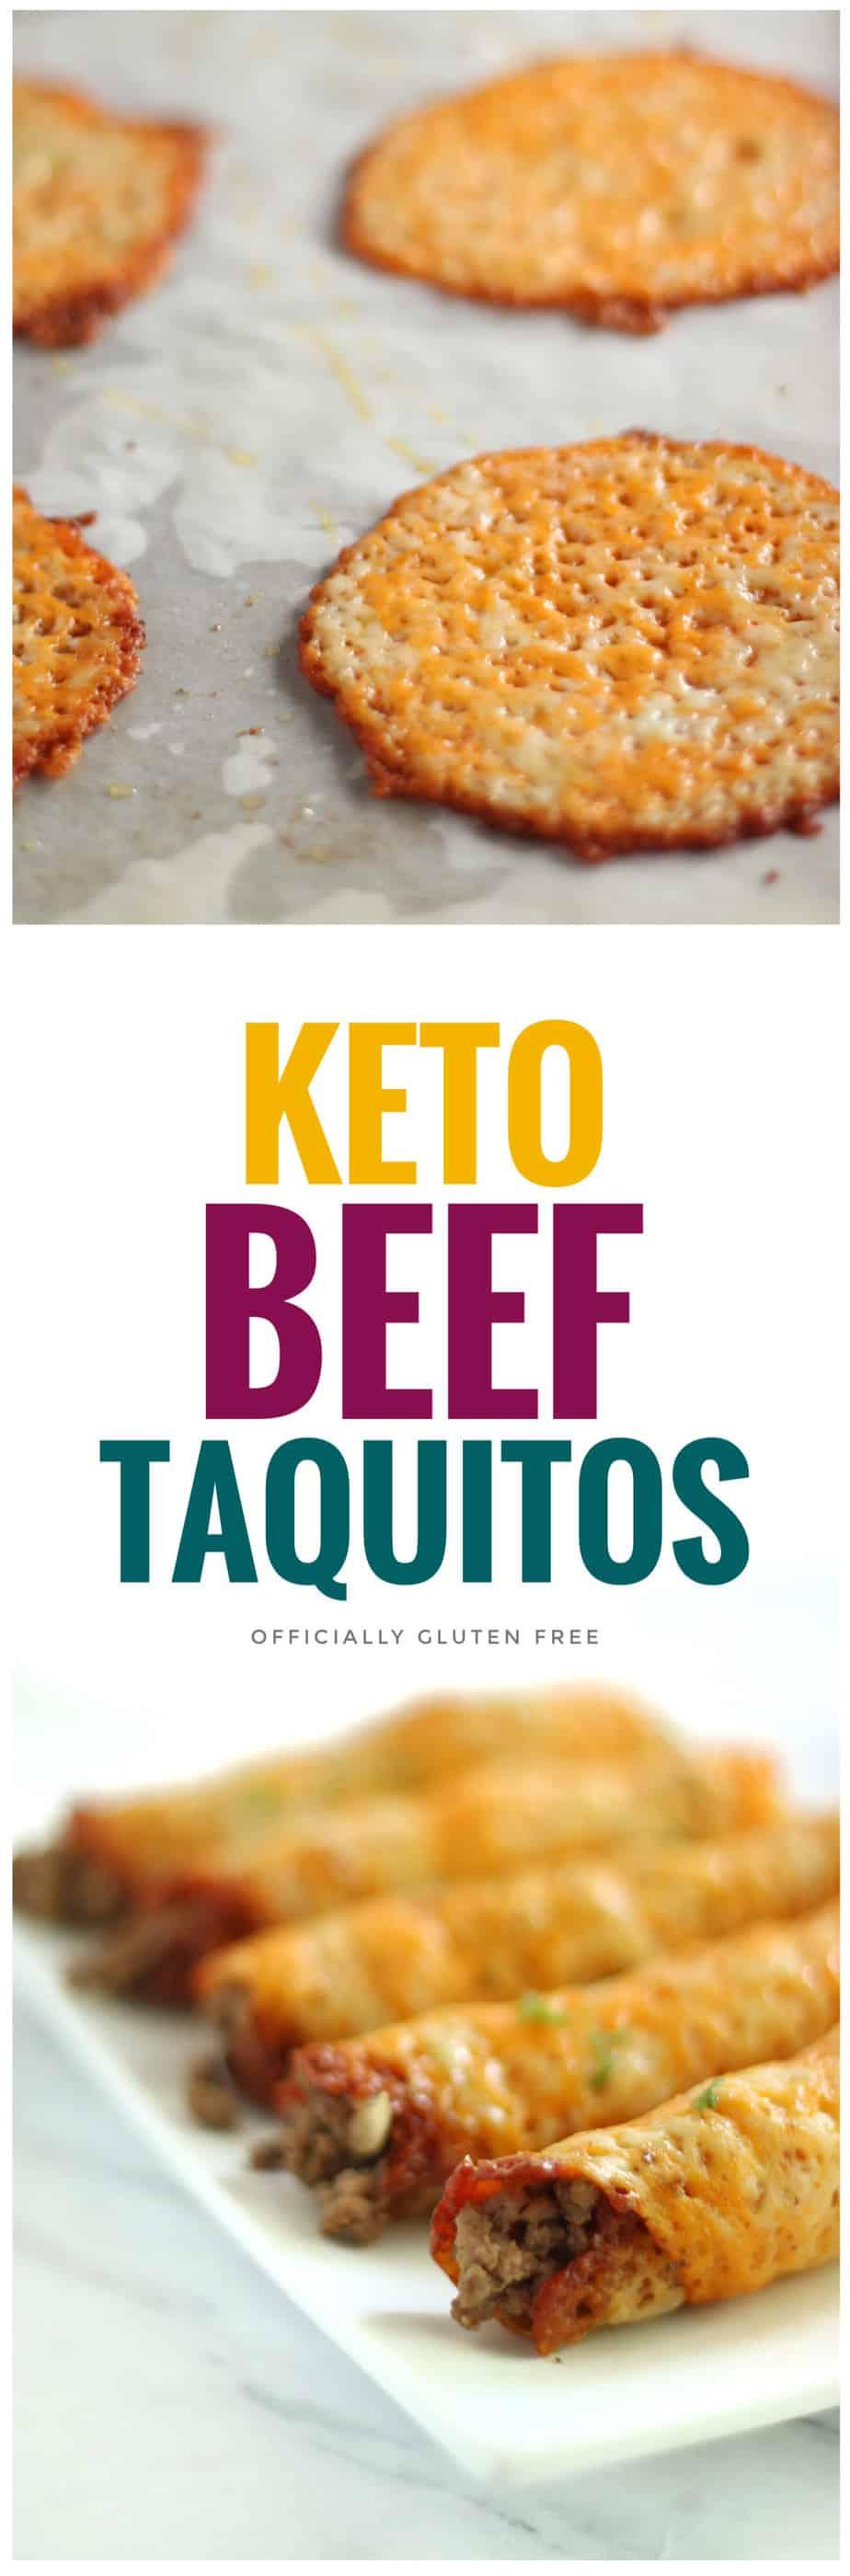 Keto Beef Taquitos